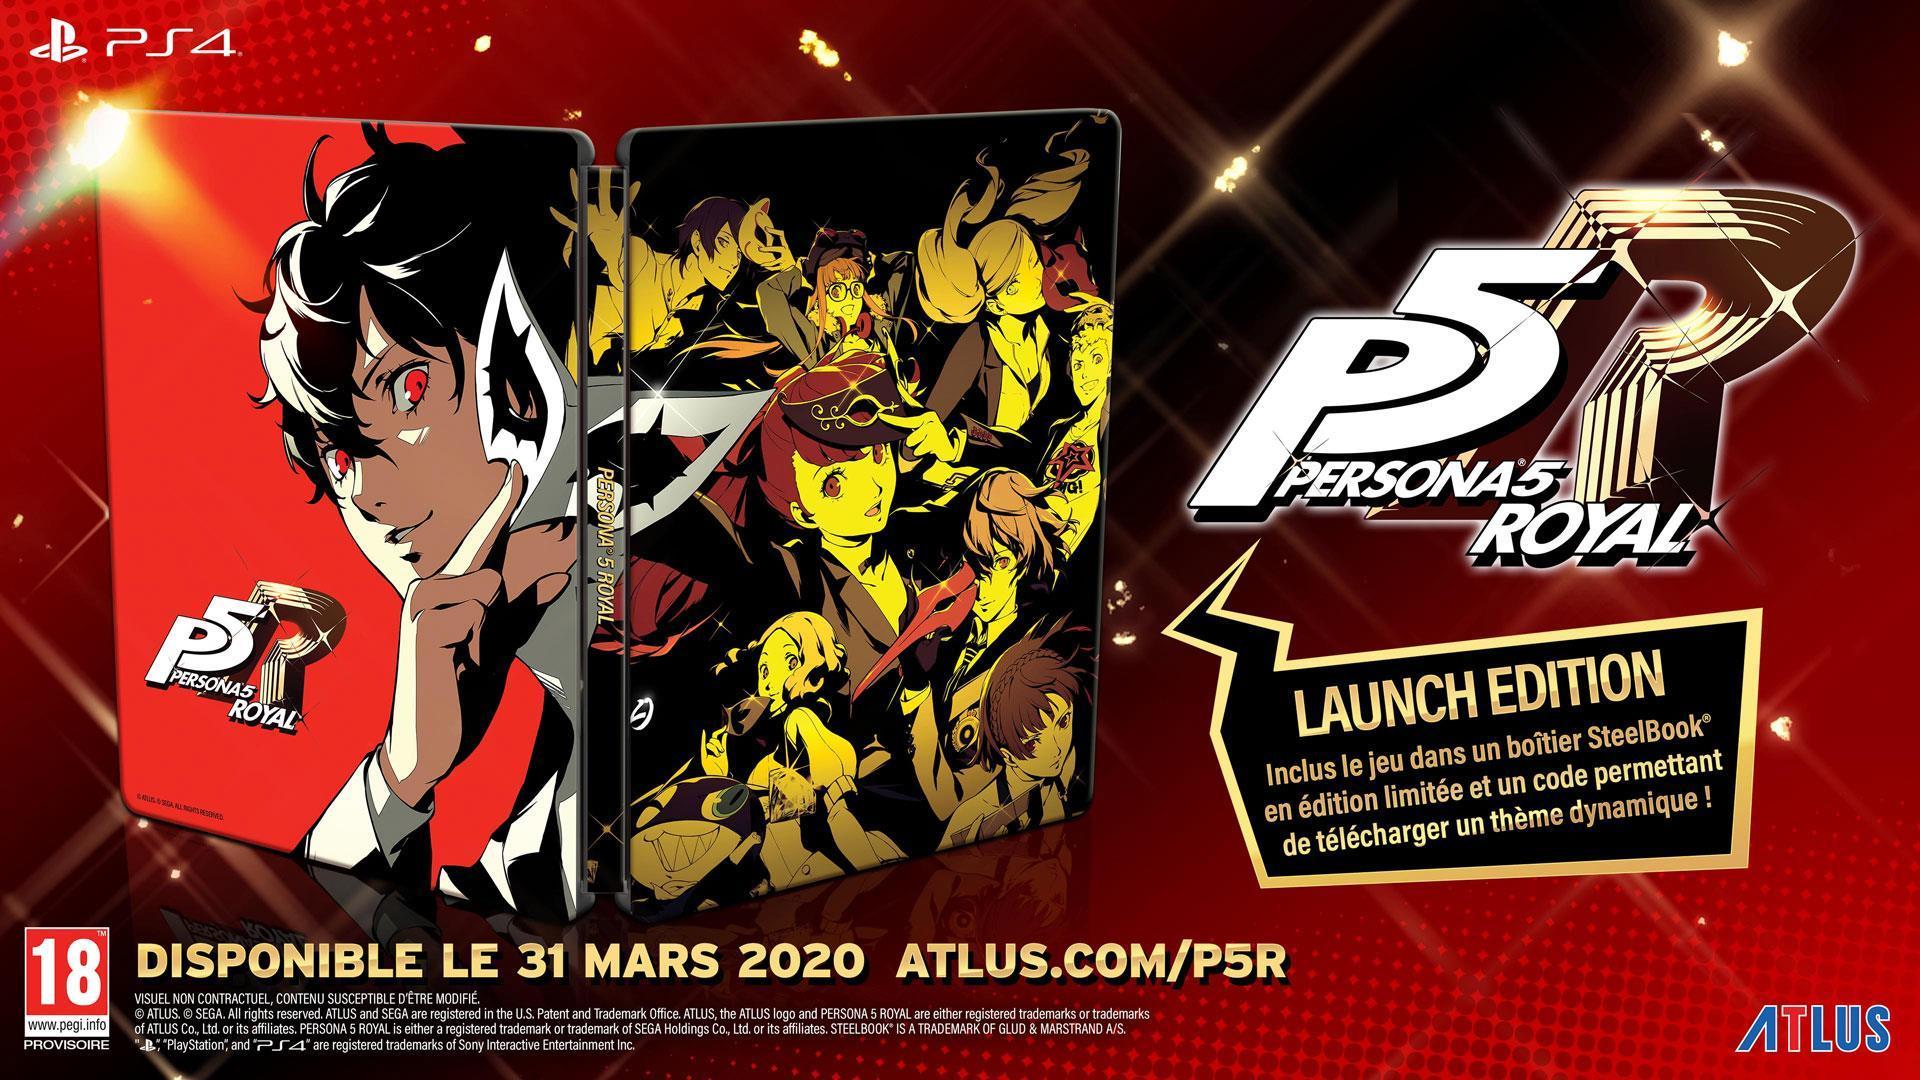 Persona 5 Royal Steelbook Launch Edition sur PS4 - Smartoys (Frontaliers Belgique)